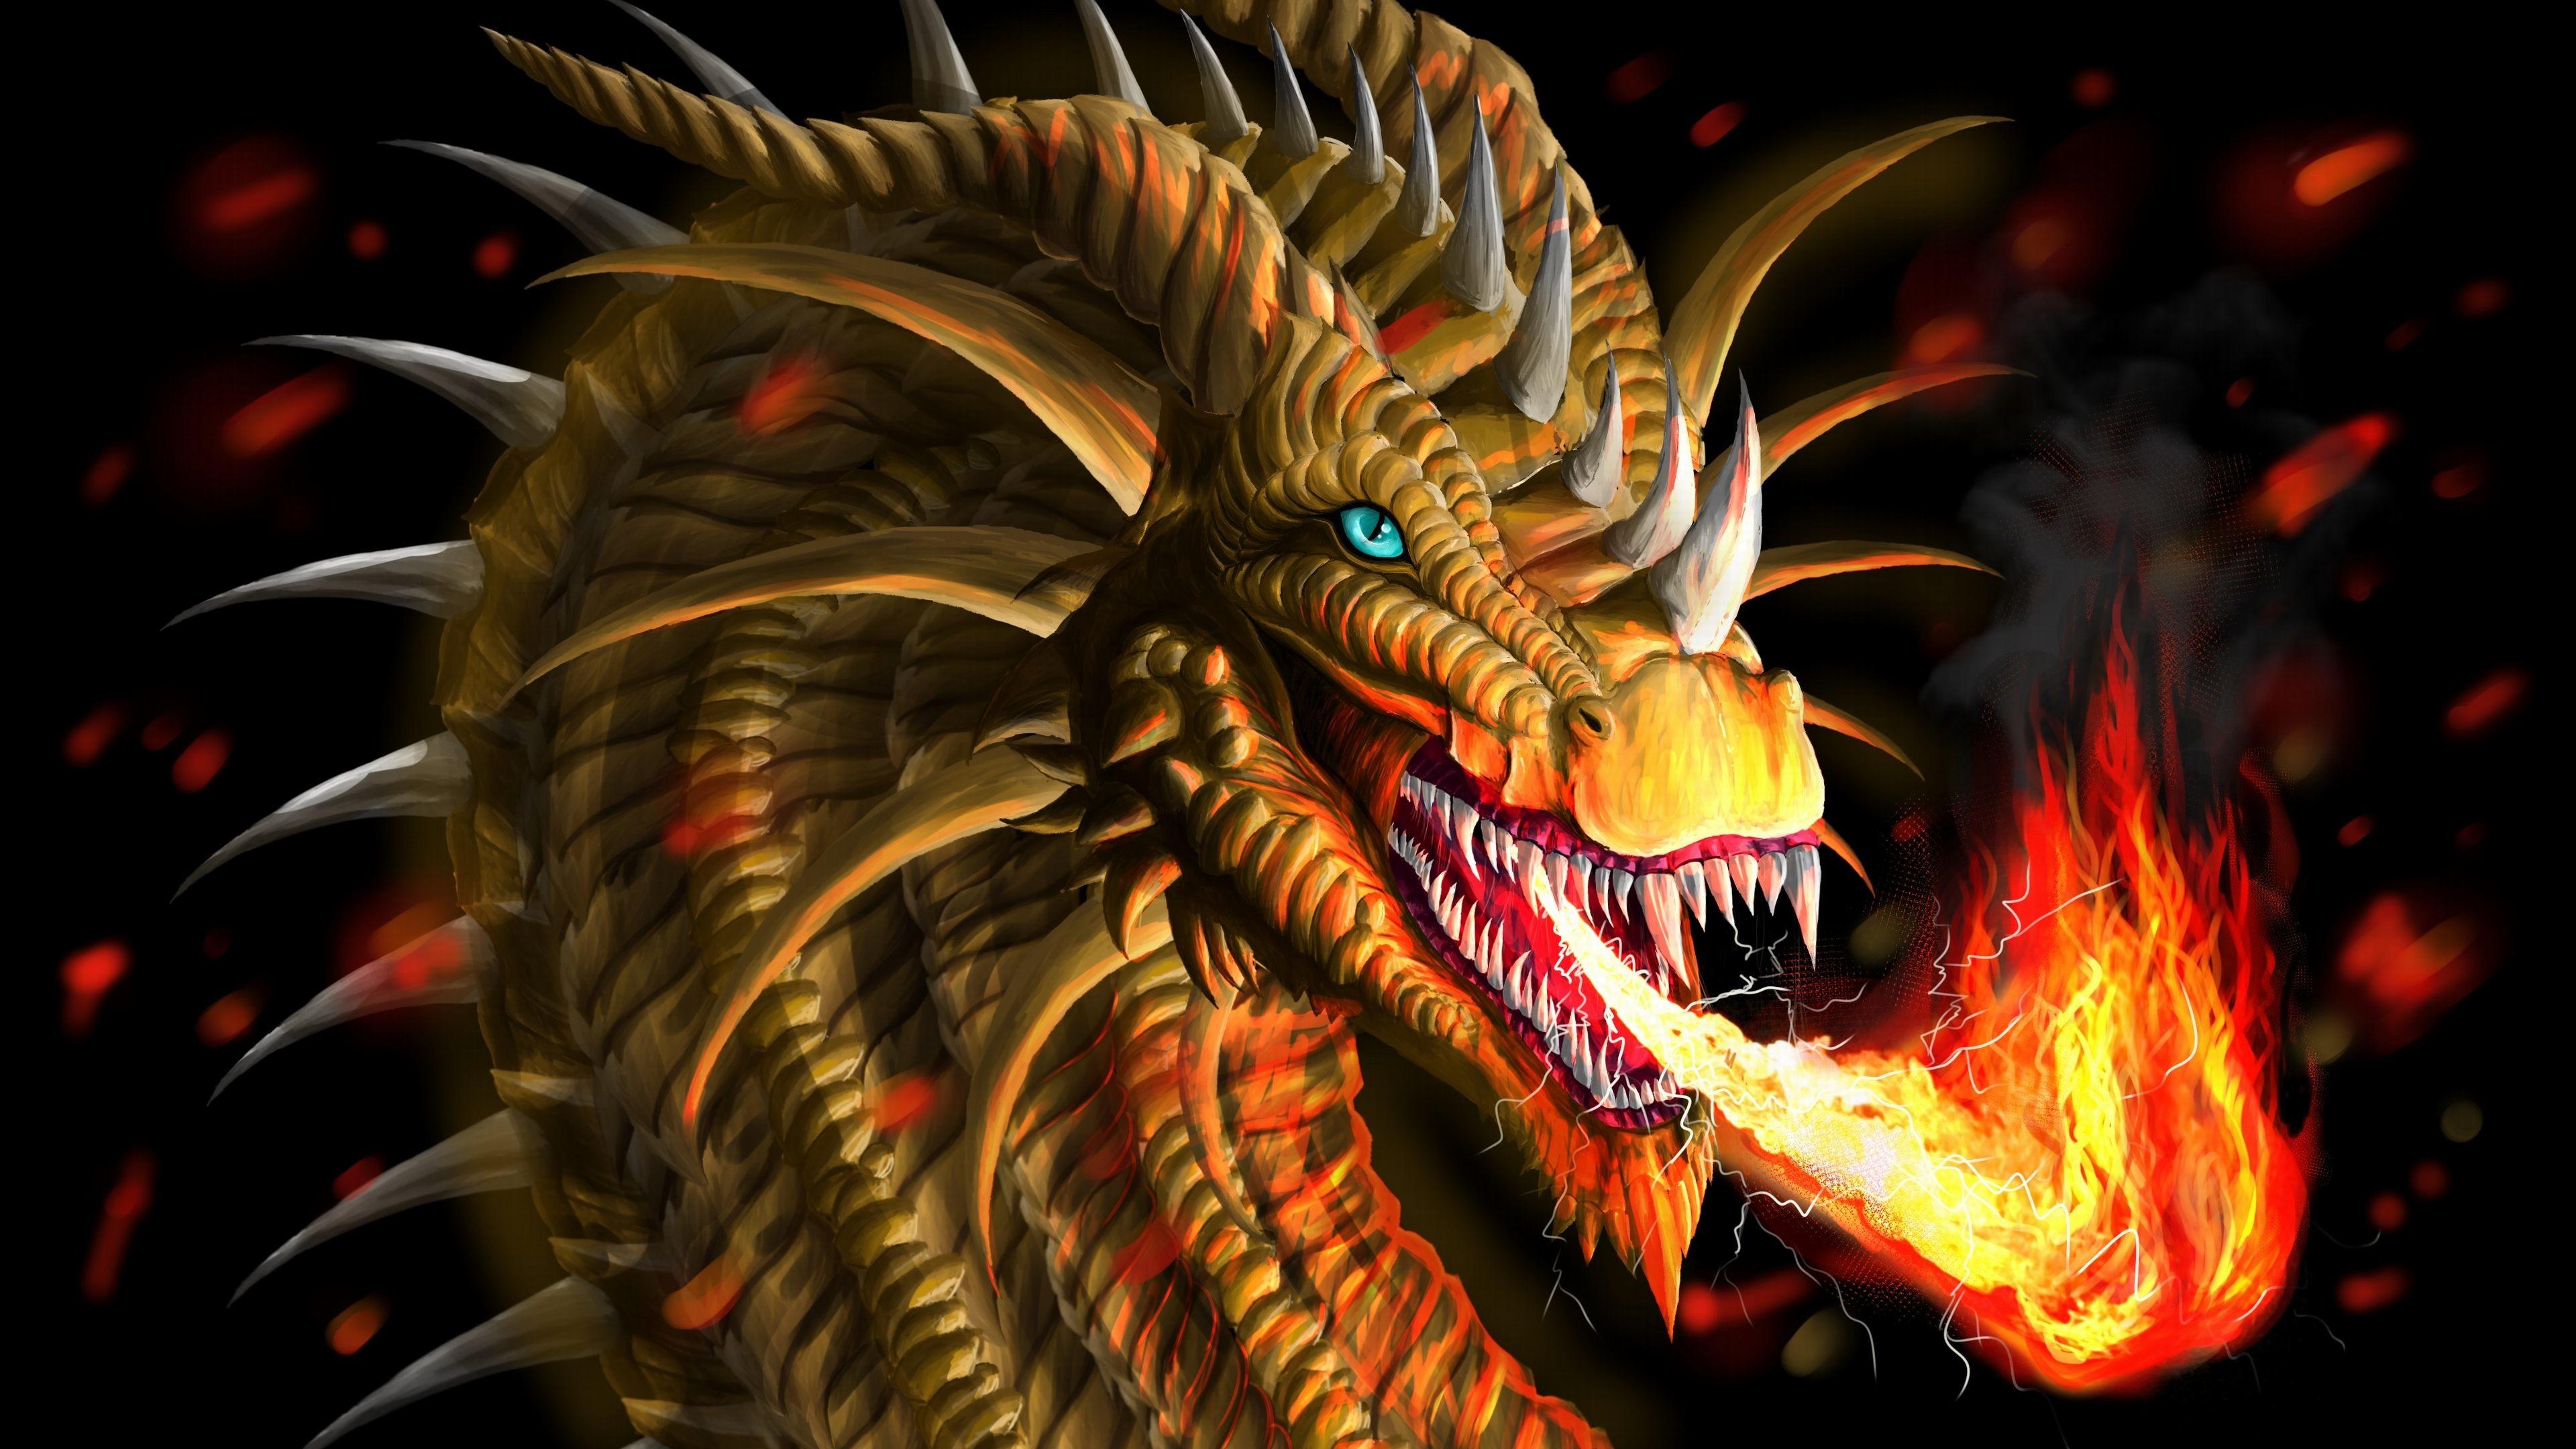 Epic Dragon Wallpaper 73 Images